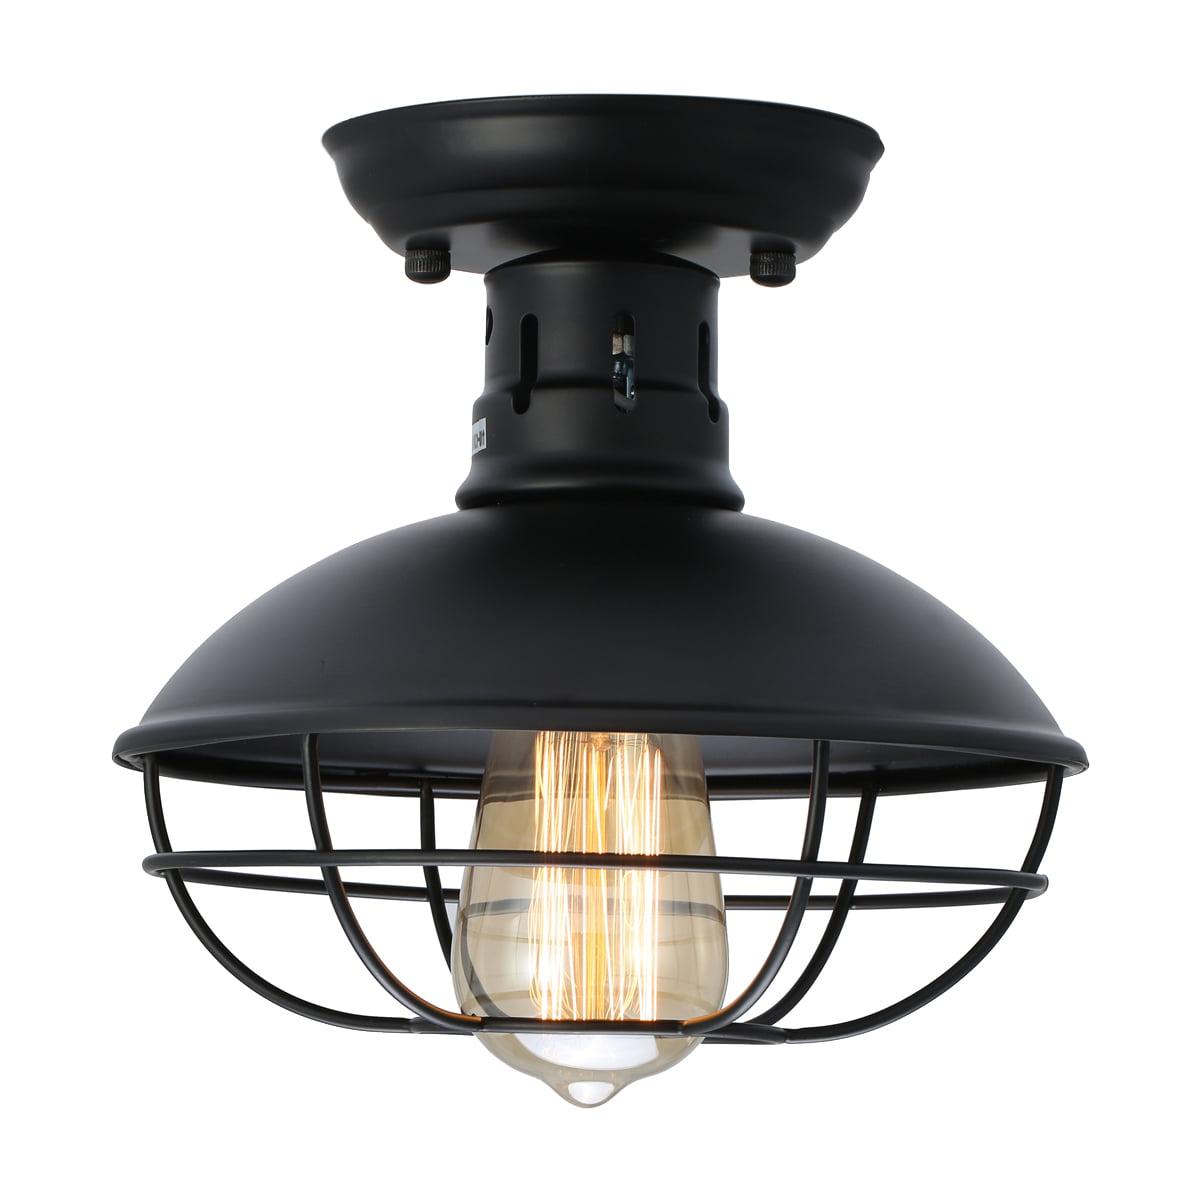 Industrial Metal Cage Ceiling Light E26 Rustic Mini Semi